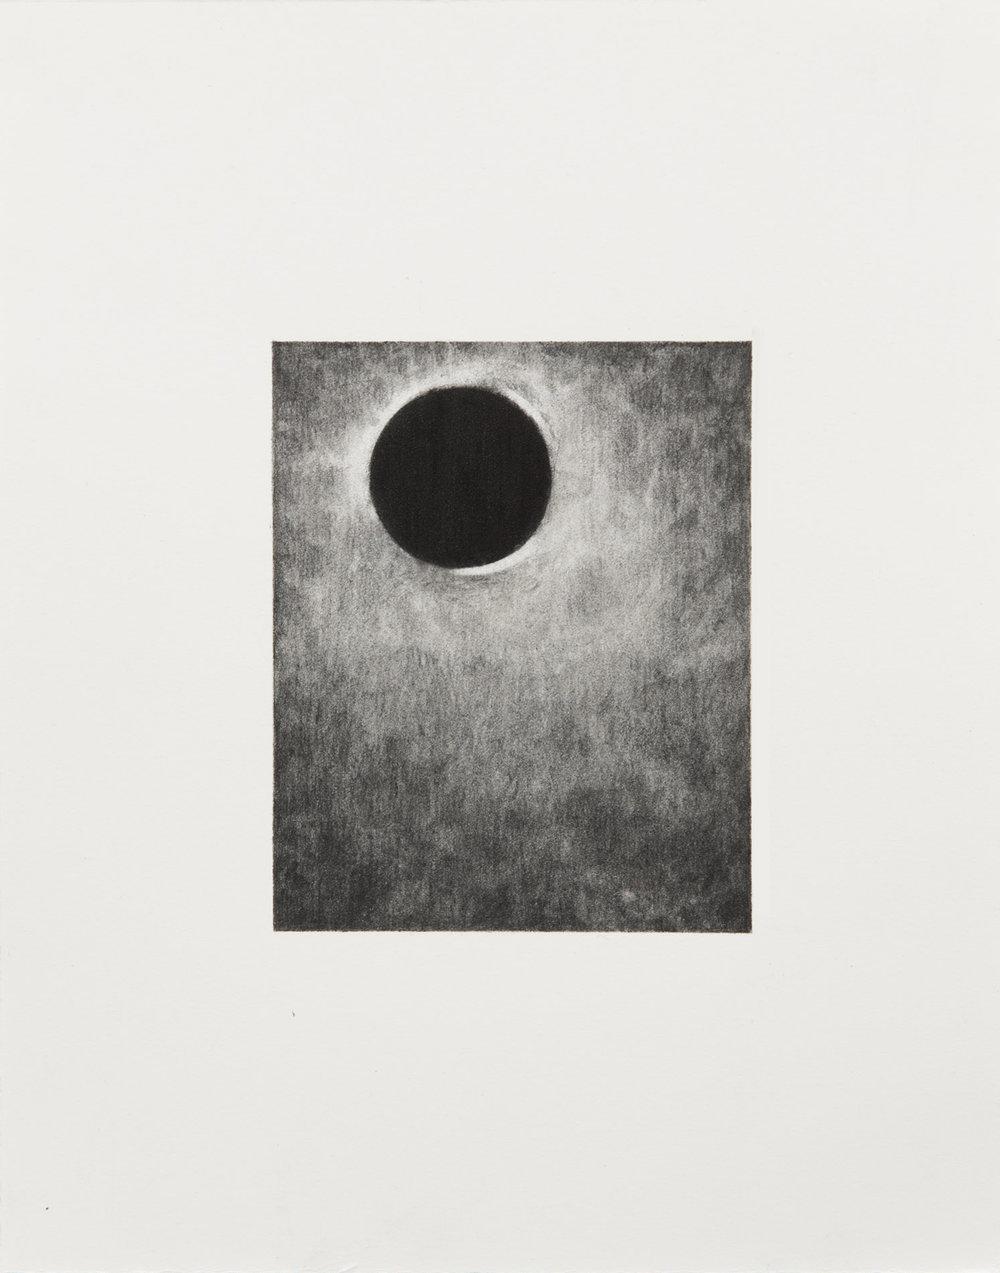 "Carl Trahan,  O   2,  2018, graphite on paper, 5"" x 4"" (12 x 10 cm)"